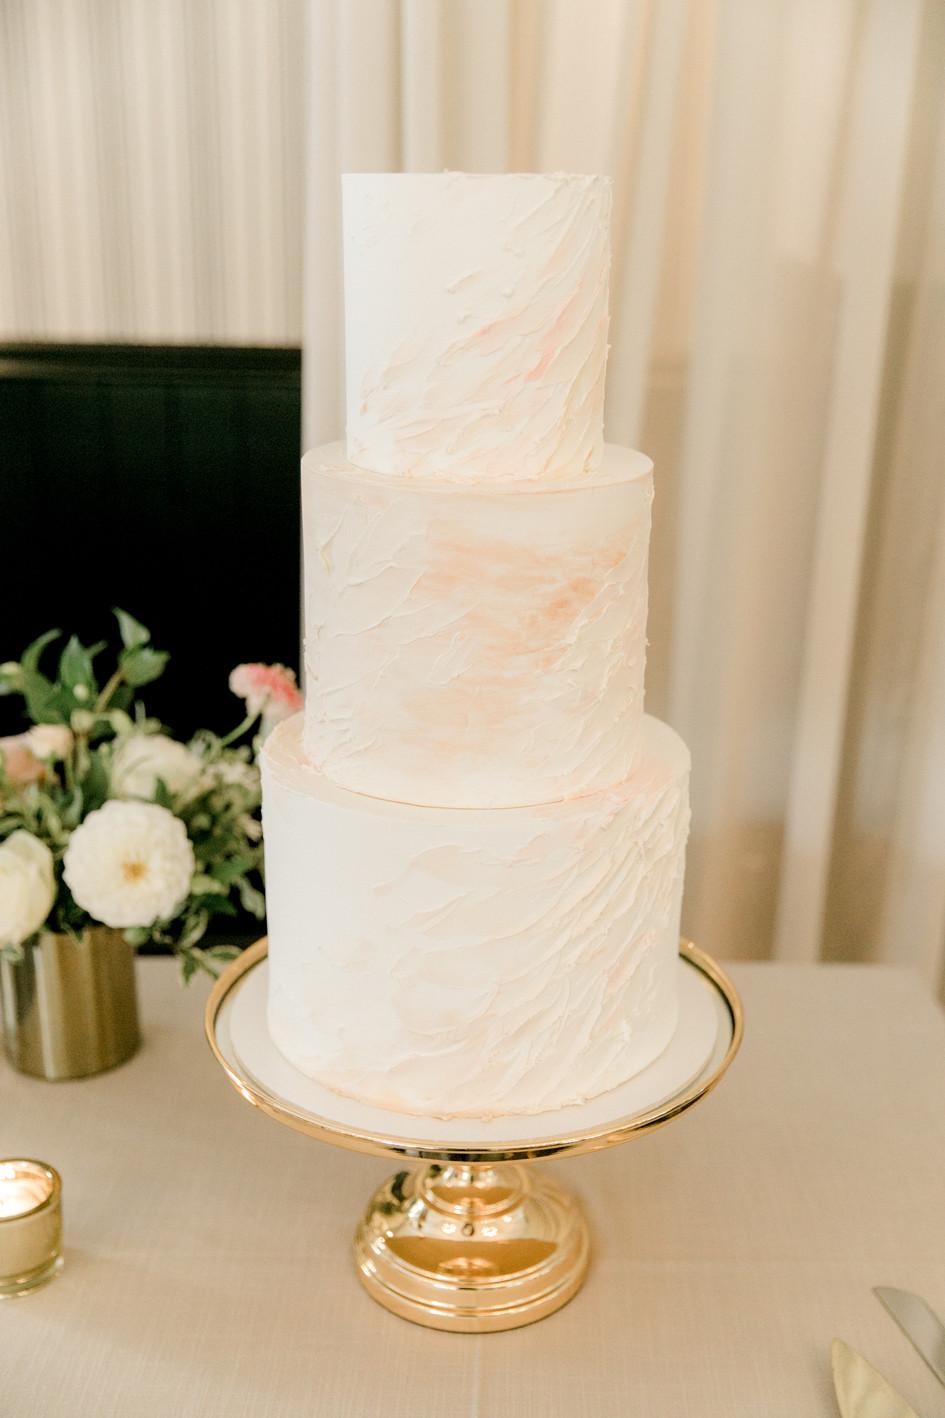 bracu_pavilion_wedding_cake.jpg